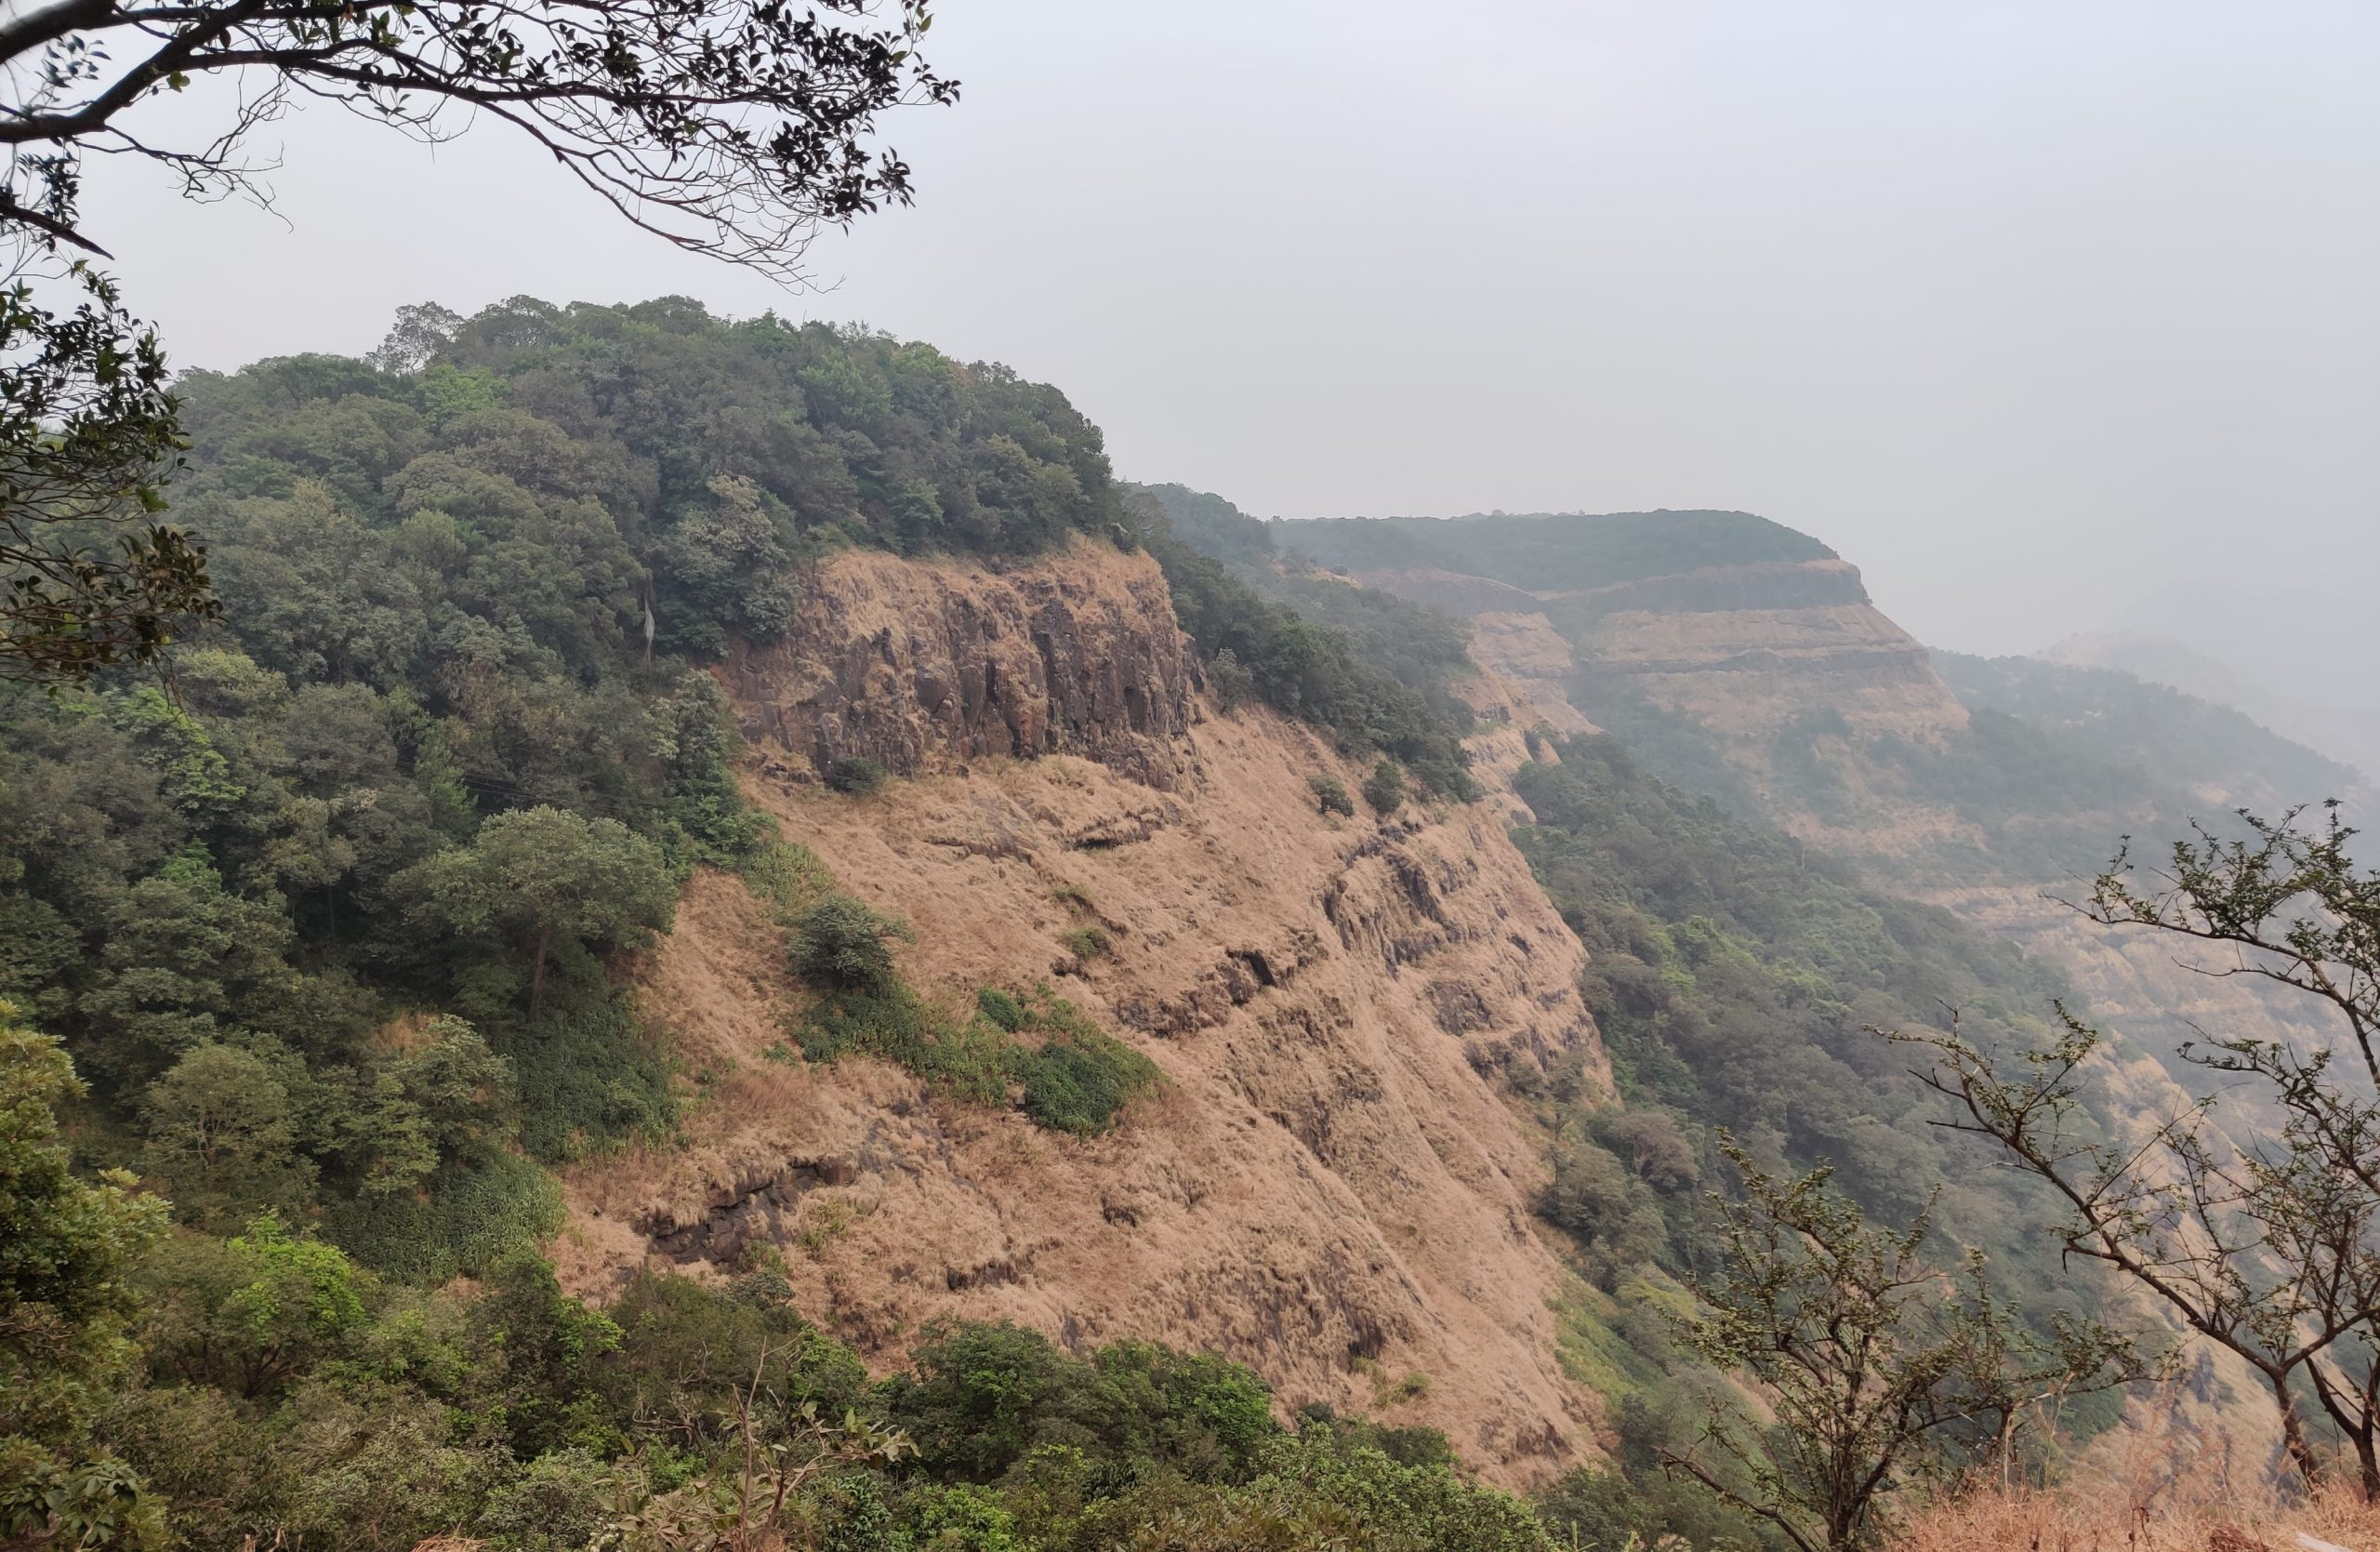 Matheran hills and mountains